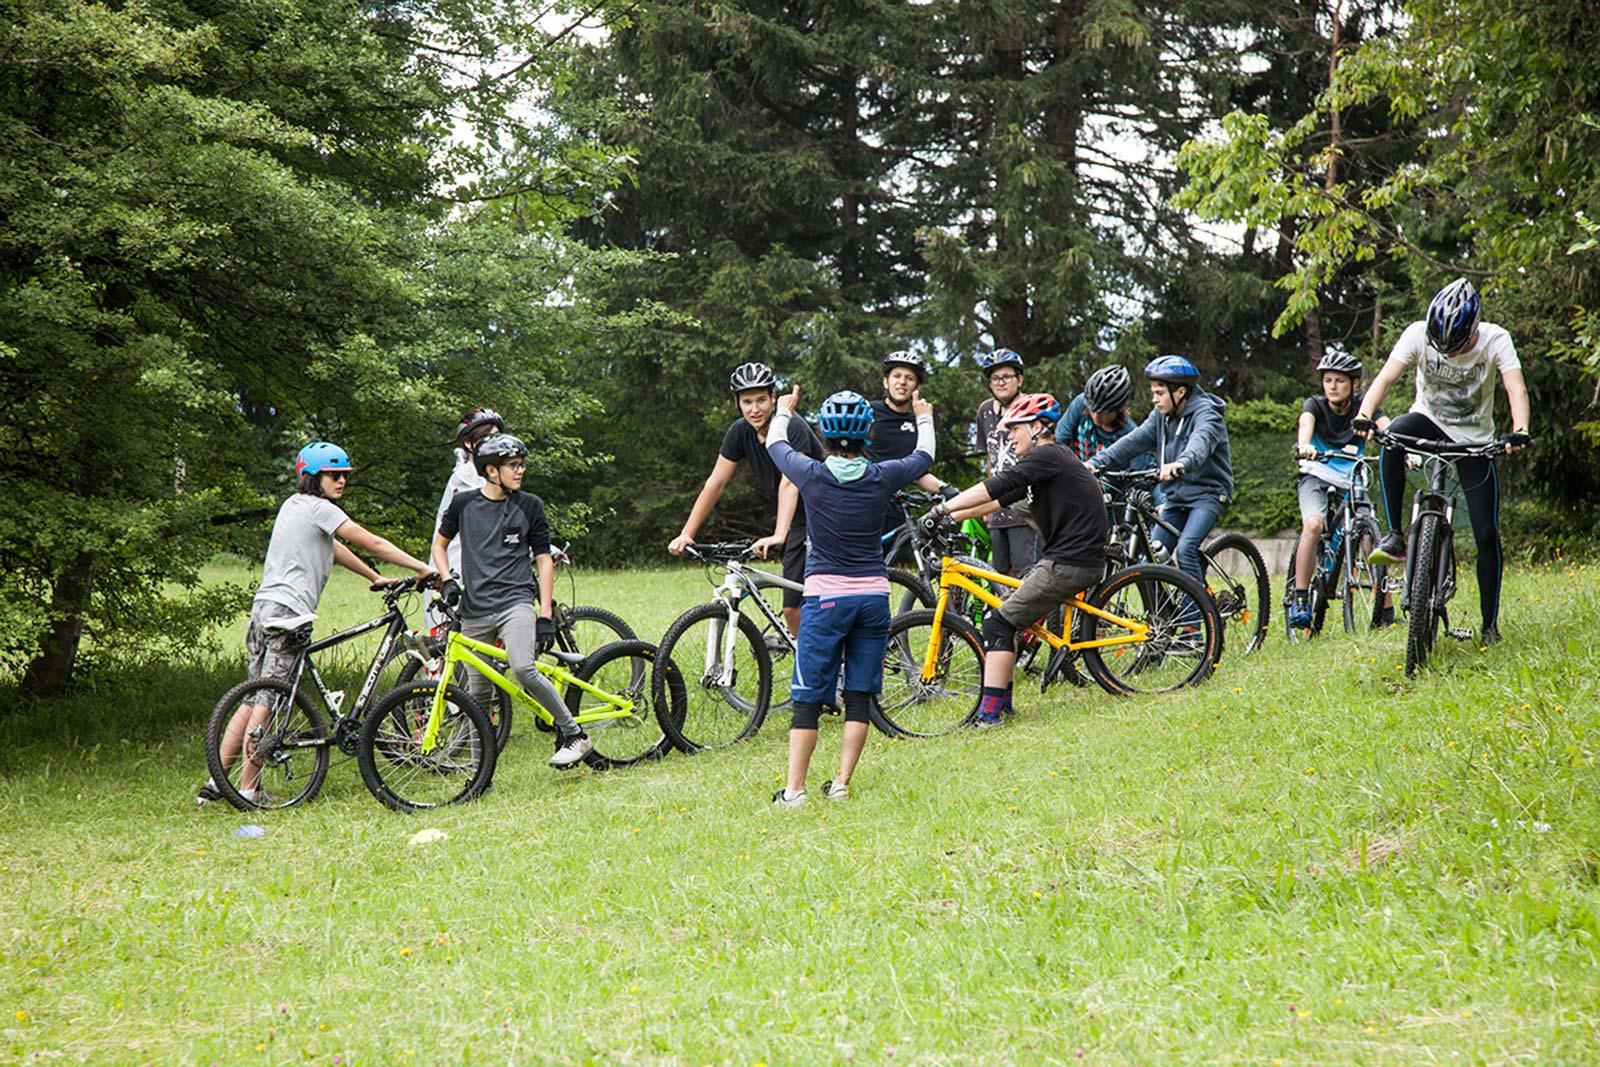 Schule geht Biken I bikehow Schulbikekurse